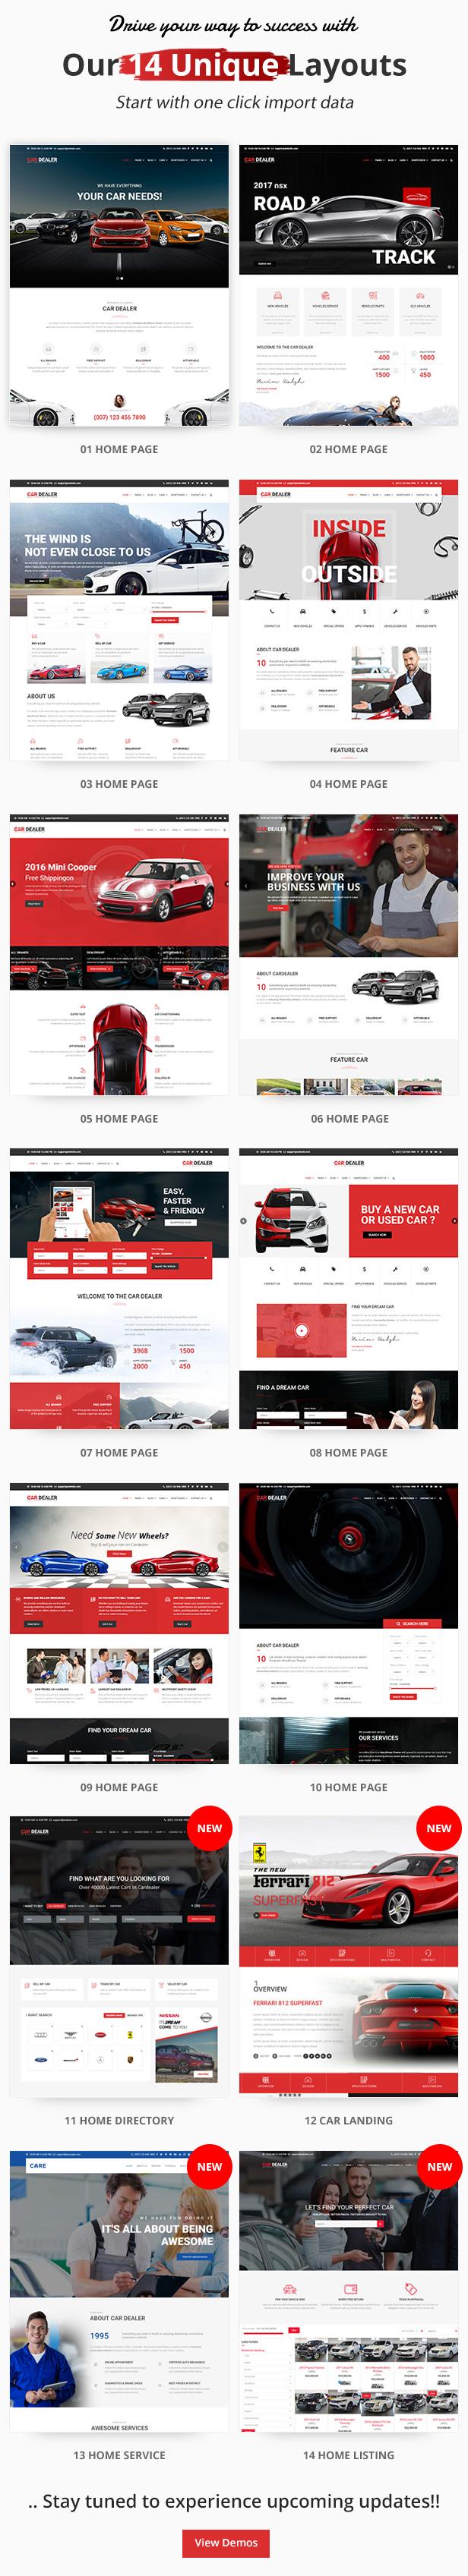 Autohändler - Automotive Responsive WordPress Theme - 7